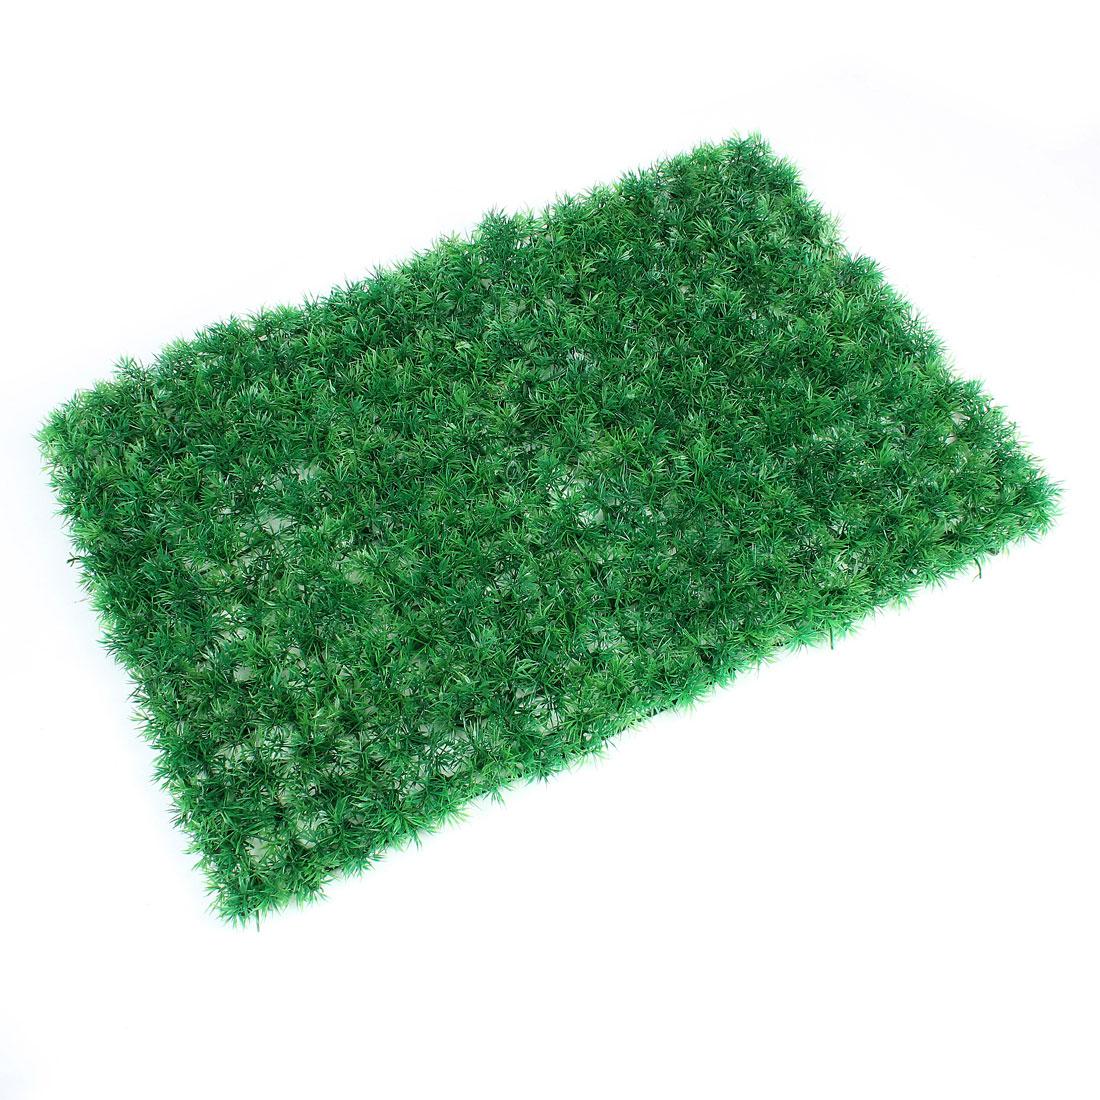 "23"" x 15.5"" Green Rectangle Artificial plastic Lawn Grass for Aquarium Tank"